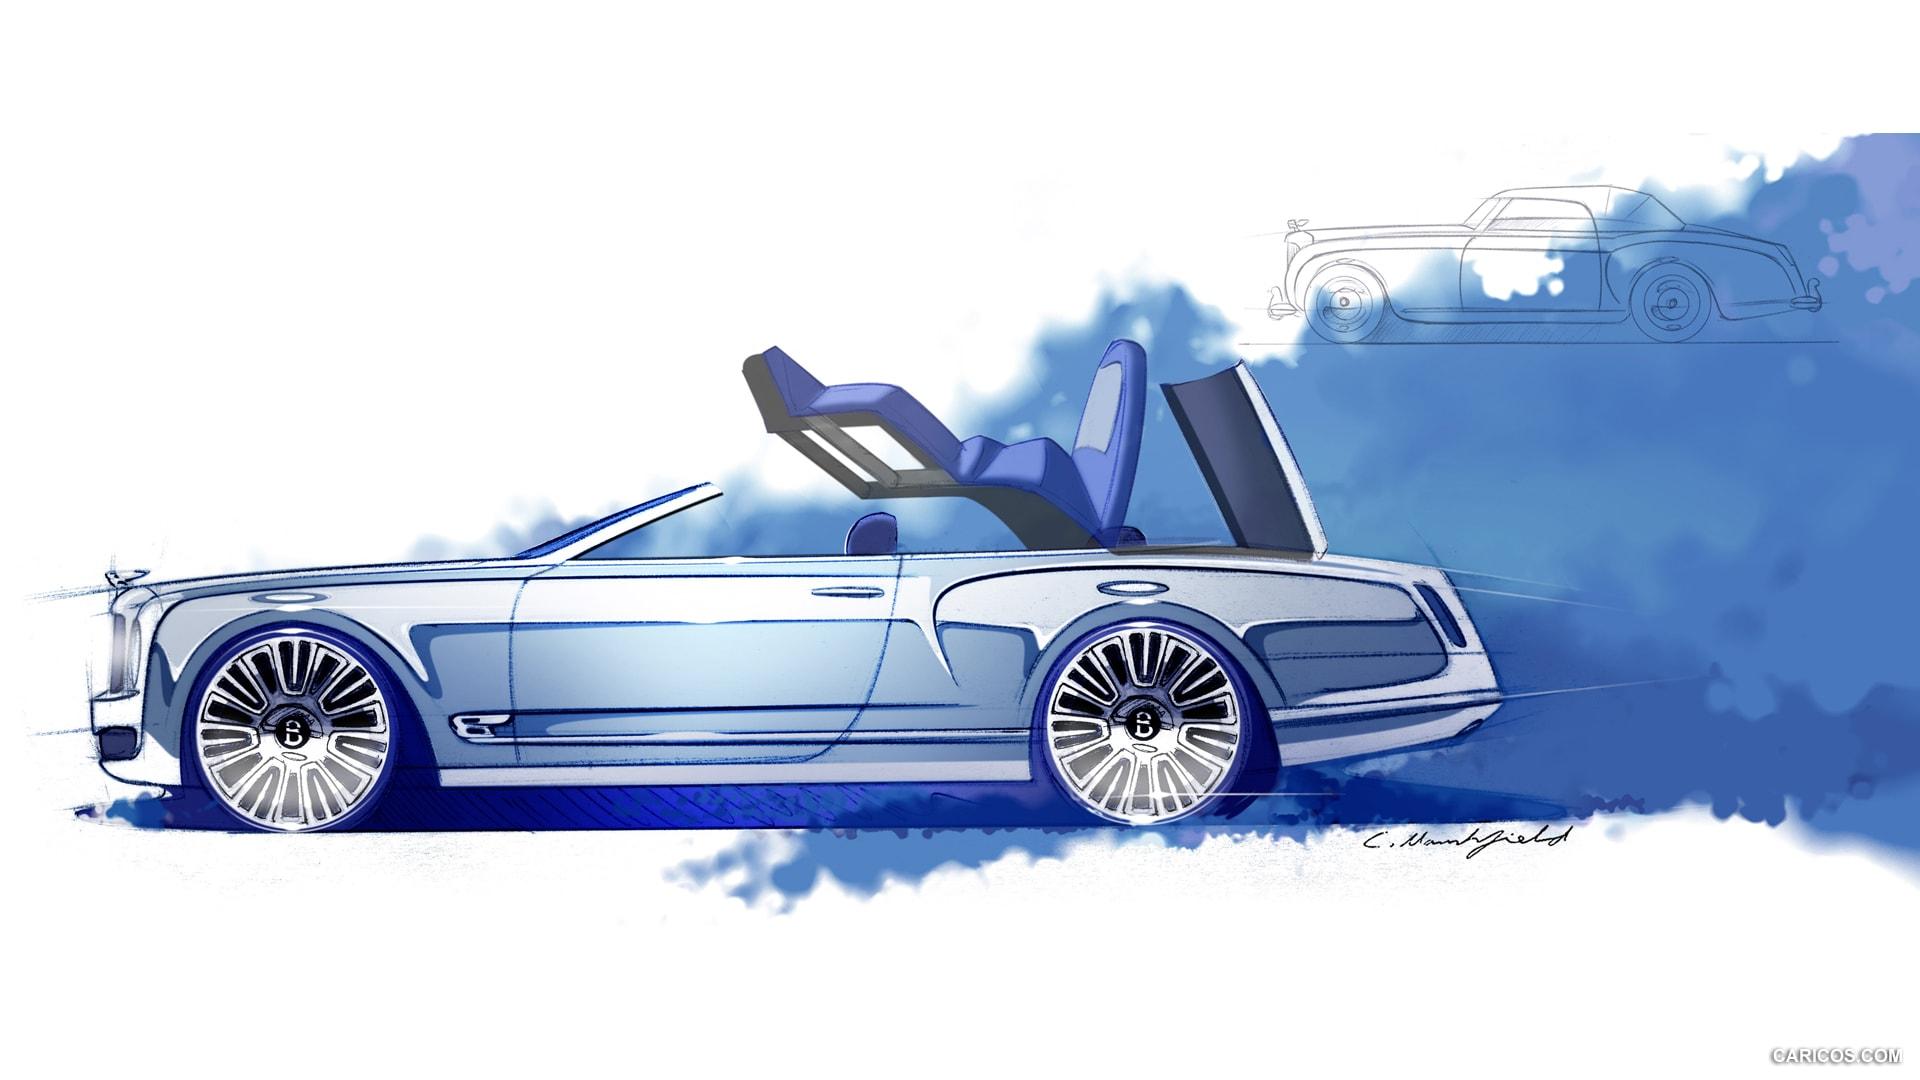 2012_bentley_mulsanne_convertible_concept_2_1920x1080